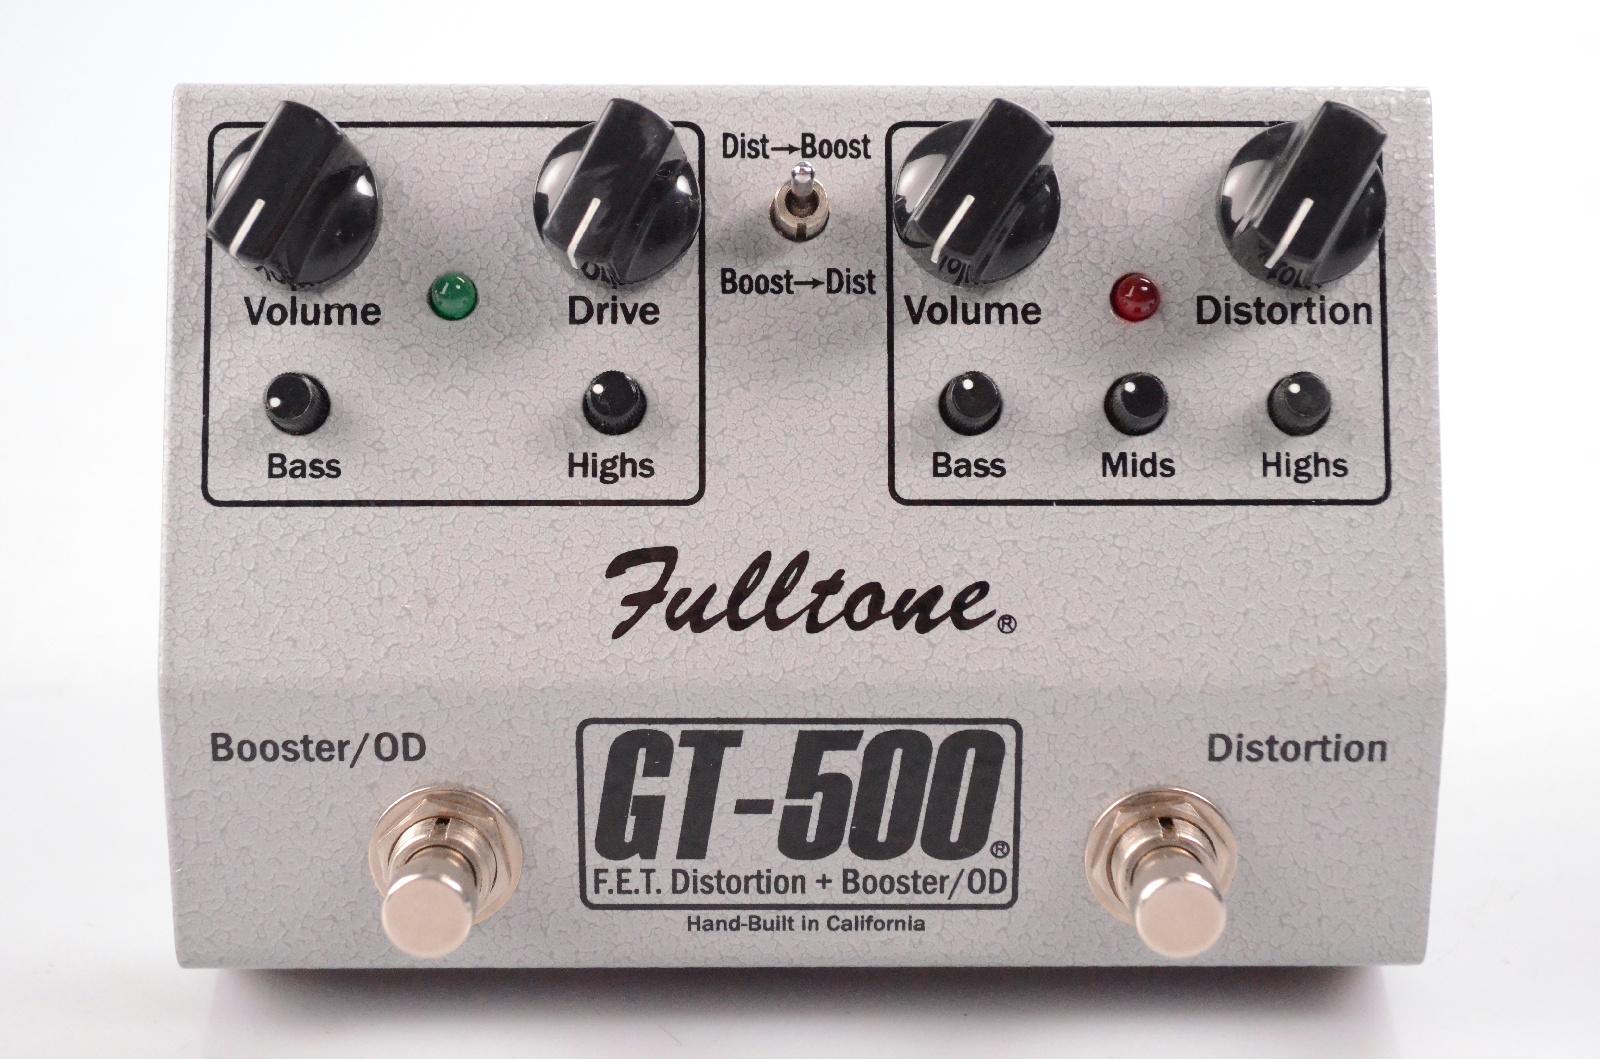 Fulltone GT-500 F.E.T Distortion + Booster OD Guitar Pedal GT500 Silver #32604